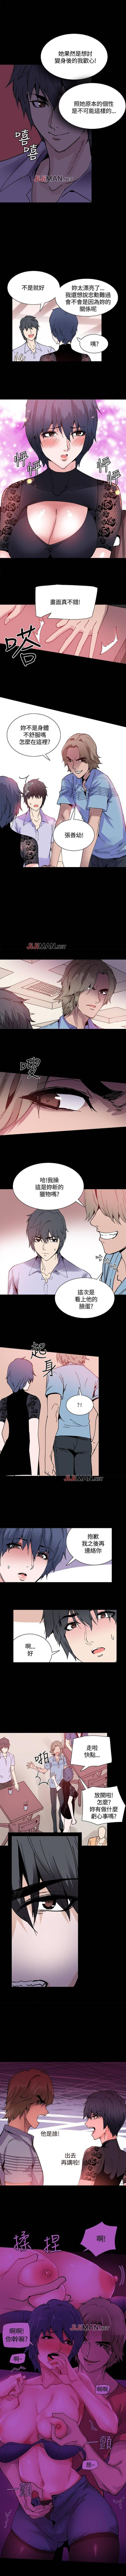 【已完结】Bodychange(作者:Seize & 死亡節奏) 第1~33话 60